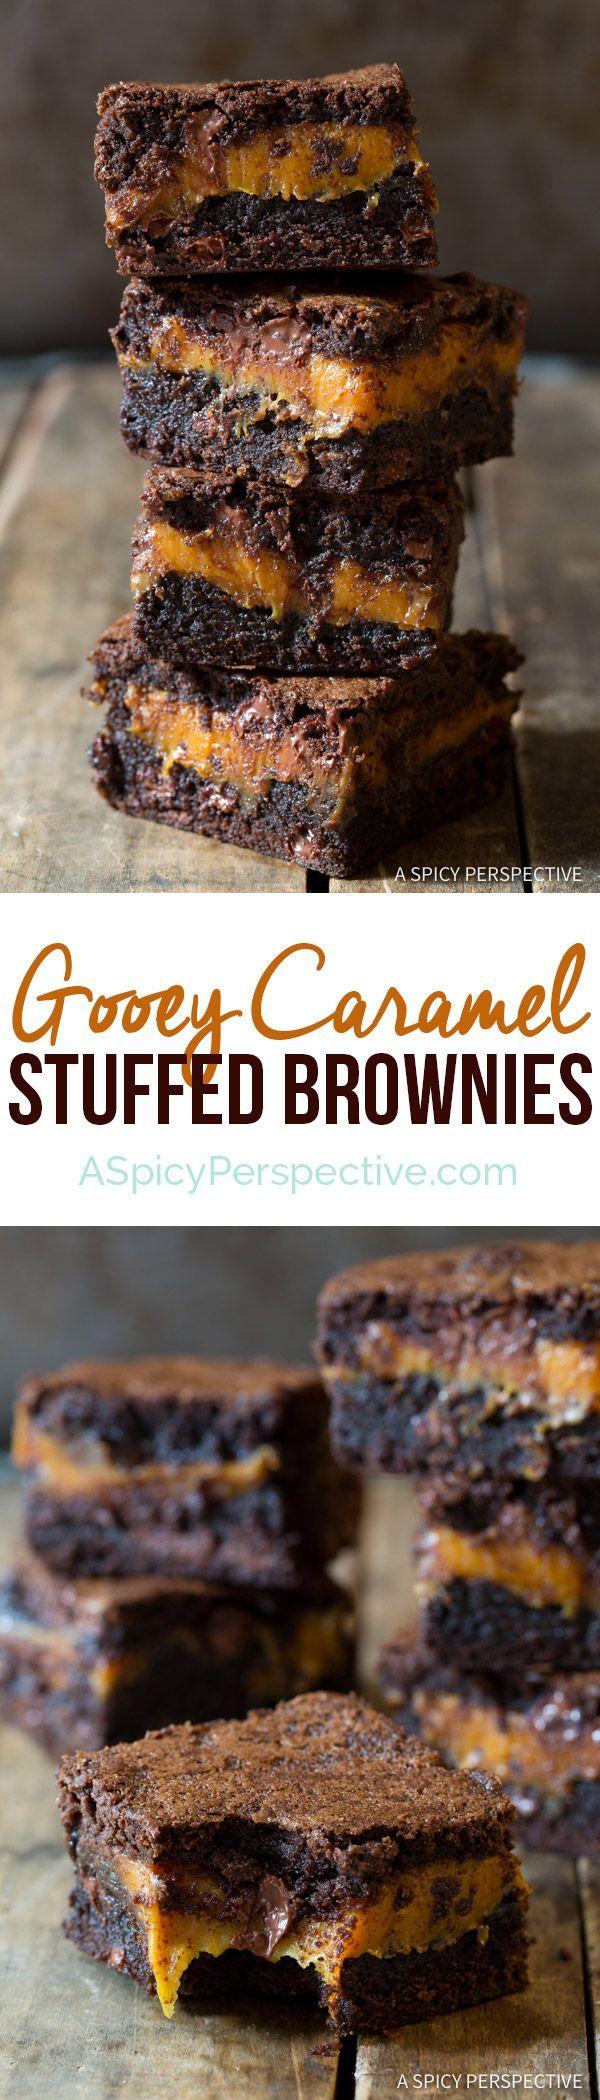 Gooey Caramel Stuffed Brownies | http://ASpicyPerspective.com